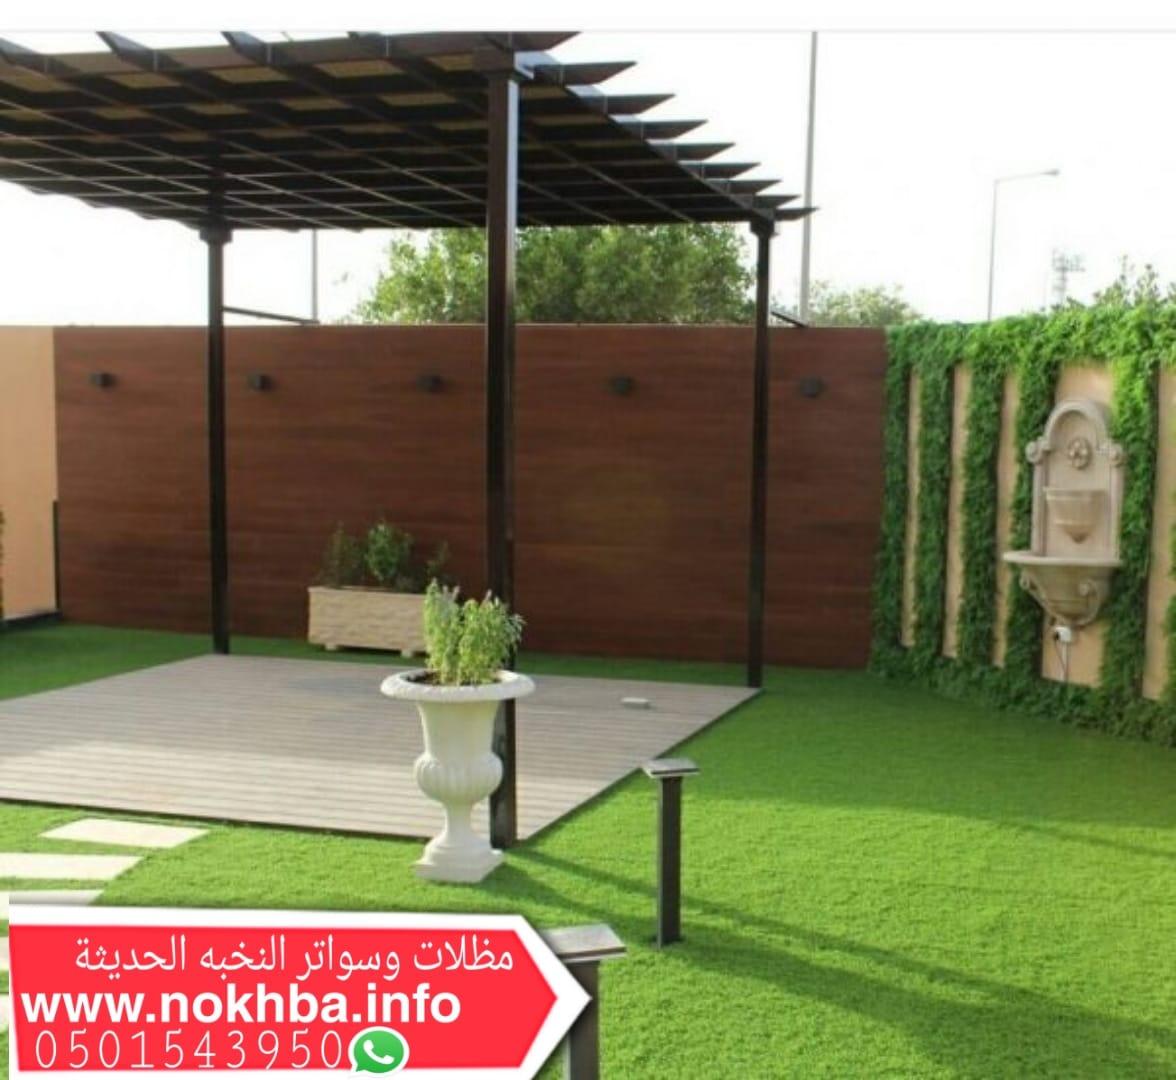 تنسيق حدائق جده , تنسيق حدائق الطائف , 0501543950 , اعشاب صناعيه , تركيب عشب صناعي , P_1753omzvc7